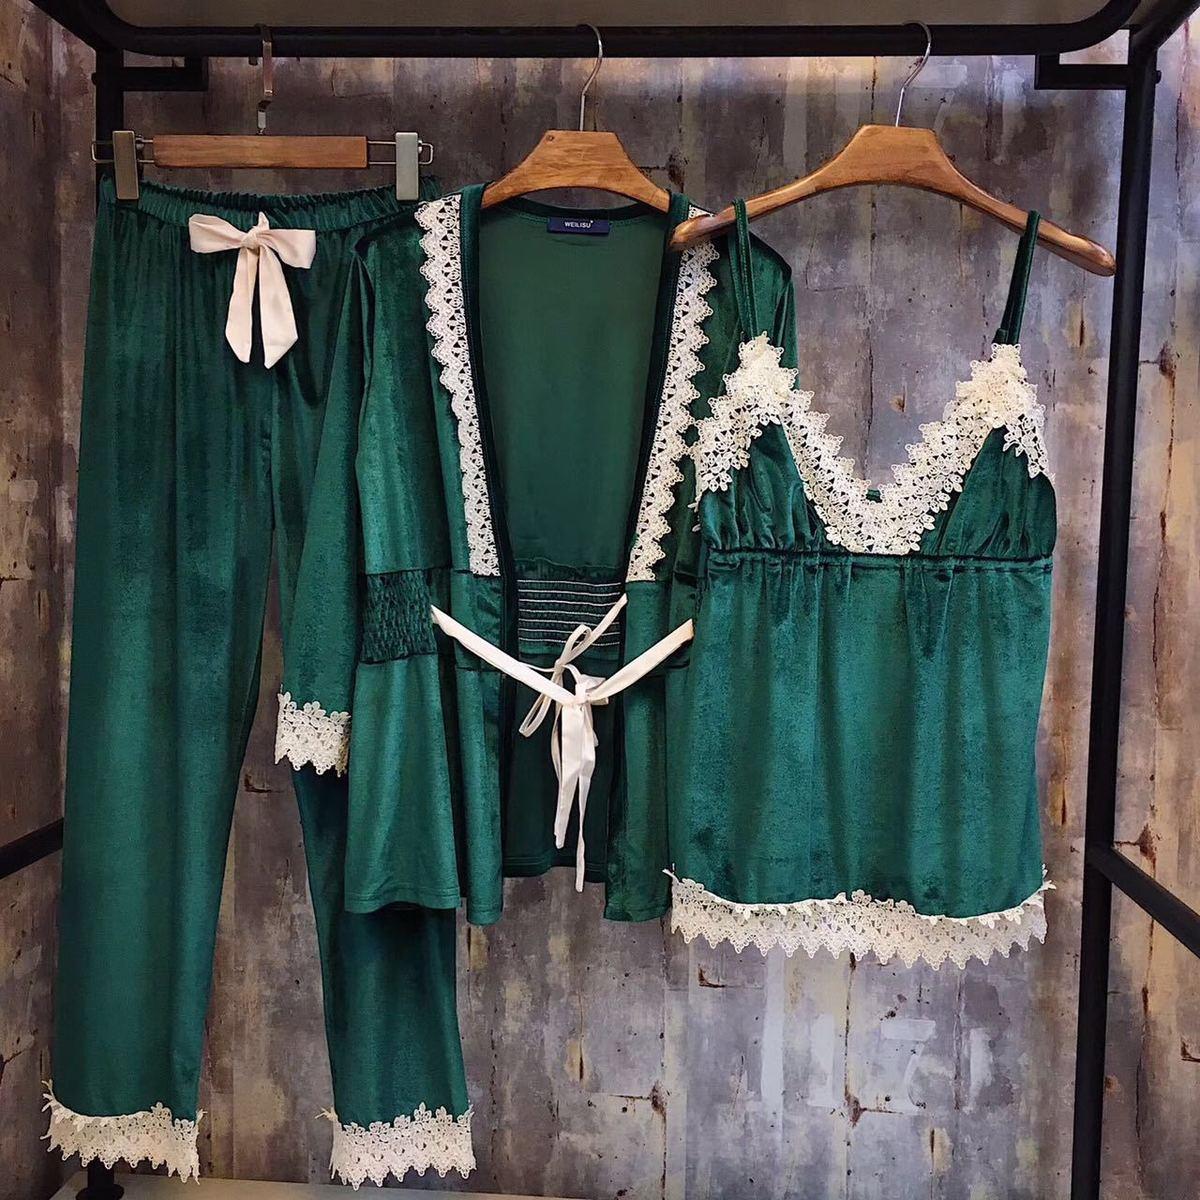 RenYvtil 2017 New Autumn Winter Women's Pajama Set Velvet Lace Nightwear 3 Pics Set Robe Trousers Home Clothes Thicken Sleepwear